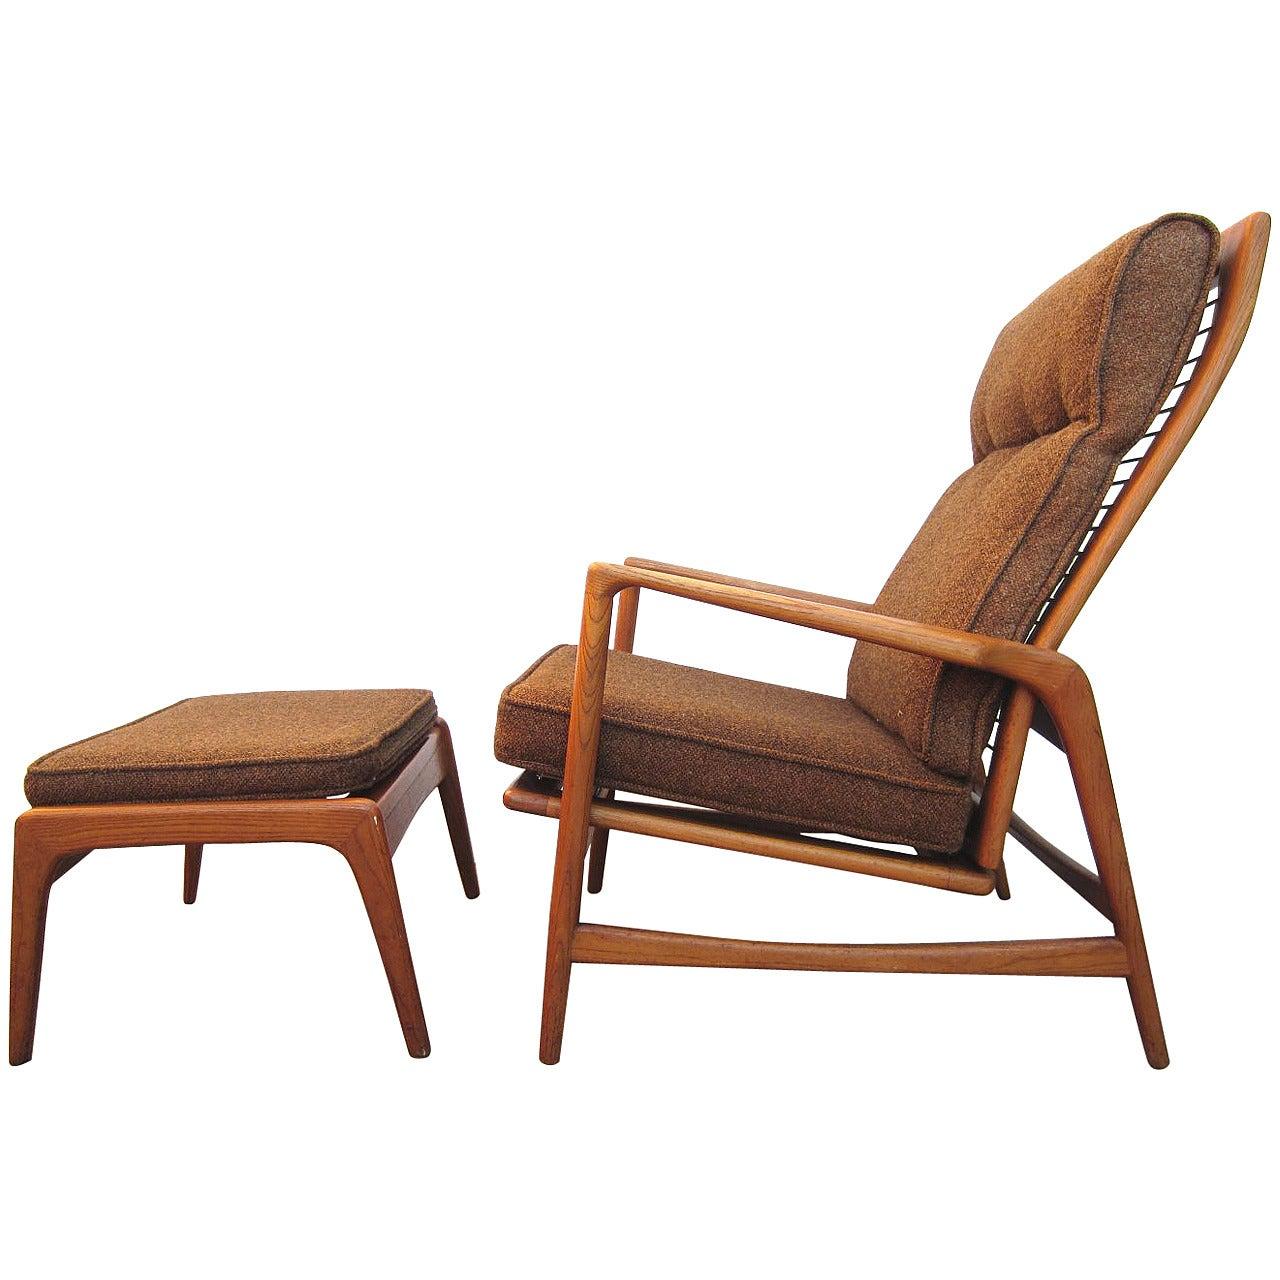 1950 Danish Mid Century Modern Lounge Chair And Ottoman Ib Kofod Larsen For Sale At 1stdibs